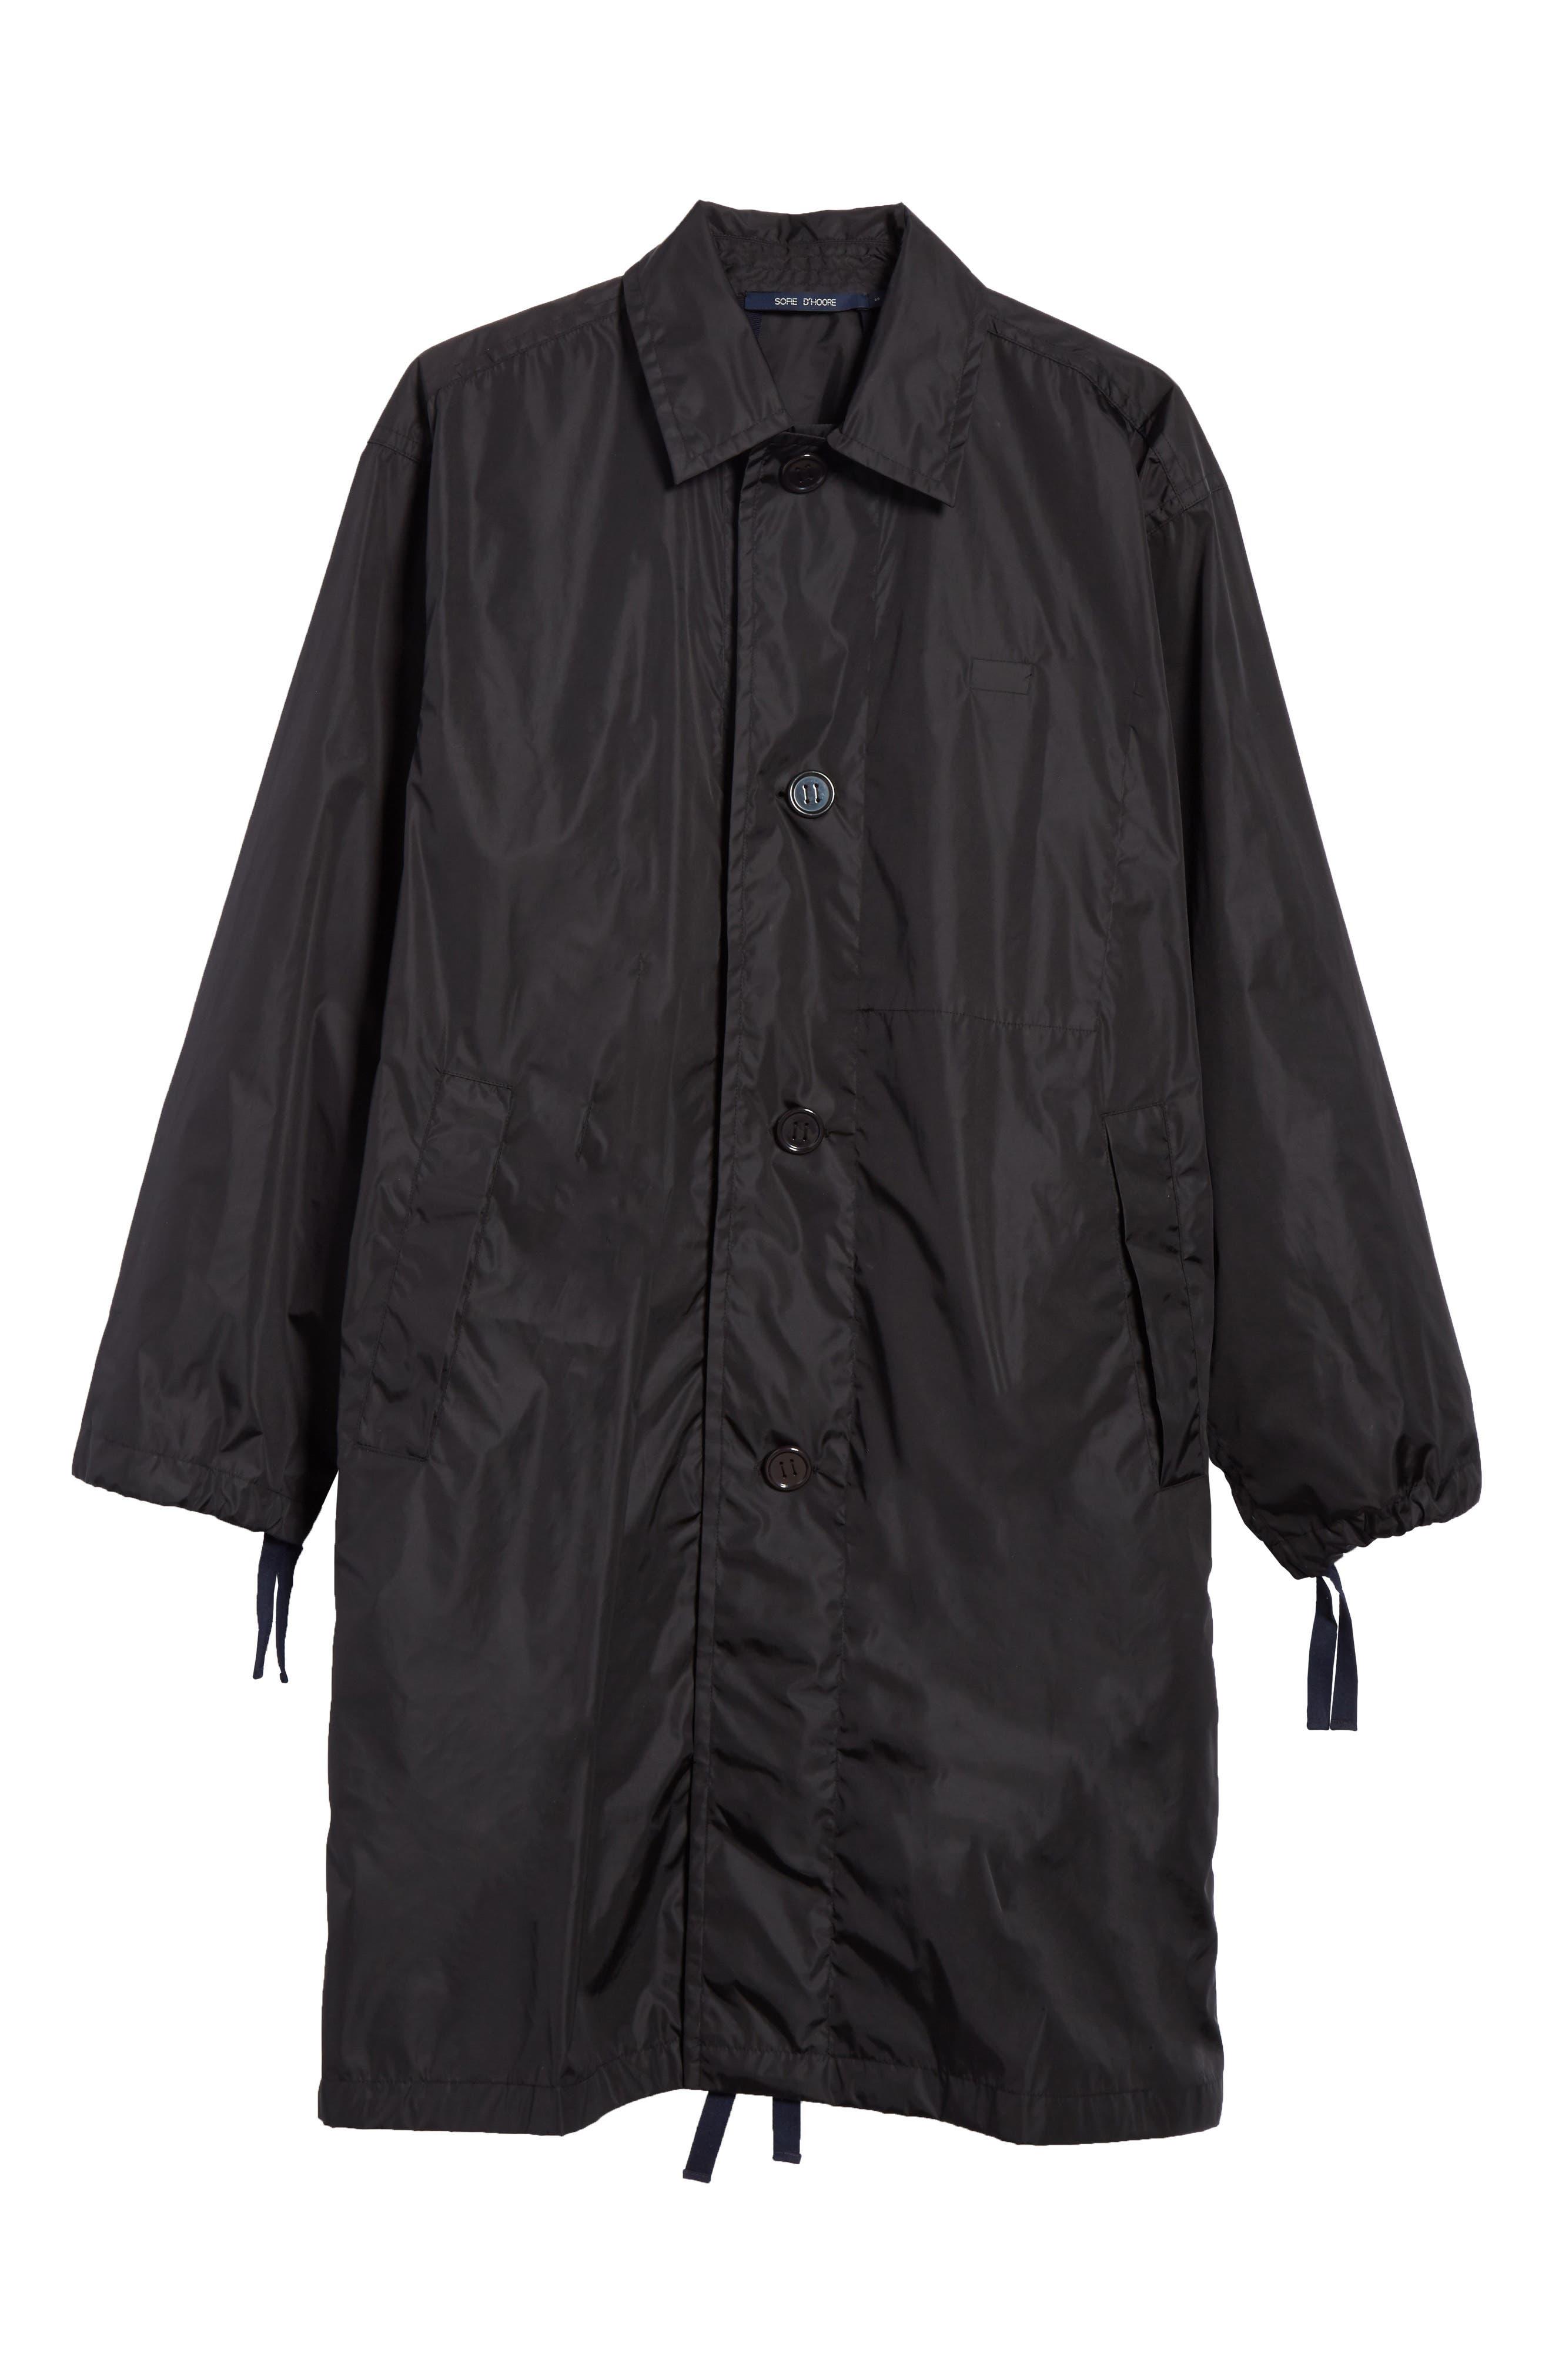 Raincoat with Inside Suspenders,                             Alternate thumbnail 7, color,                             Black